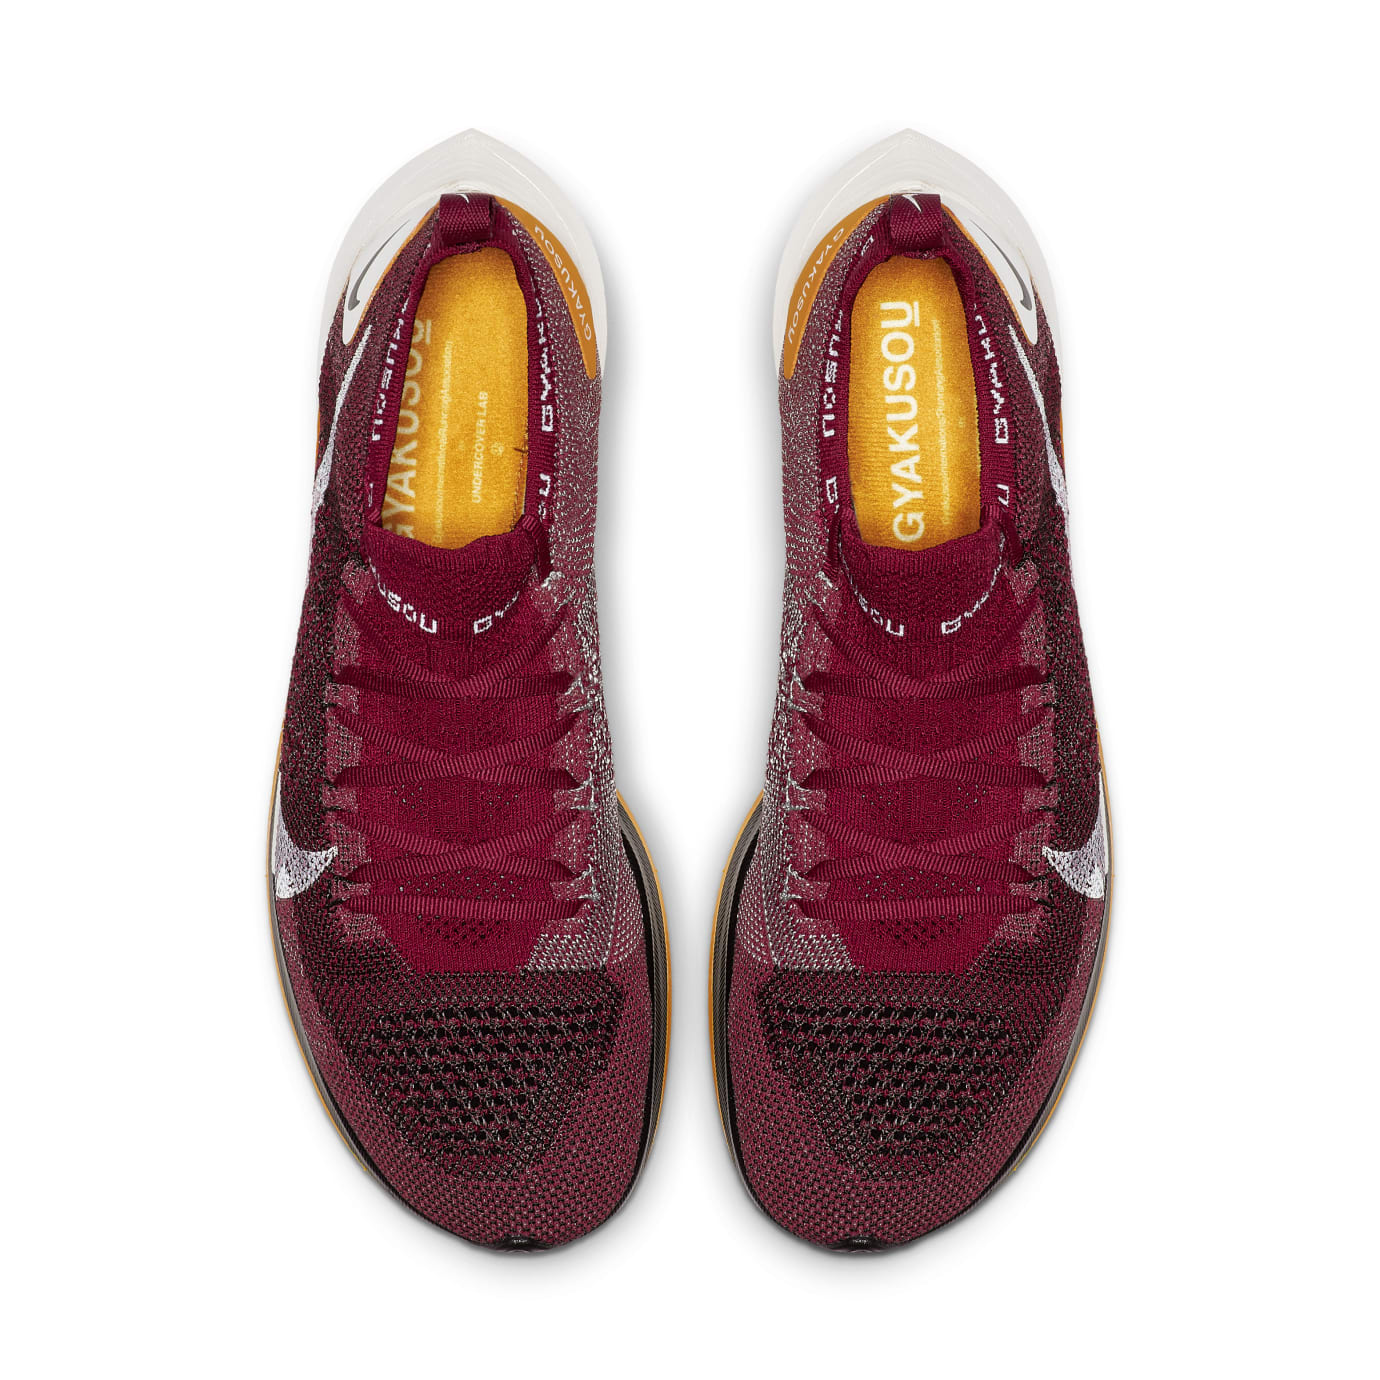 Nike Gyakusou VaporFly 4% AV7998-600 (Top)